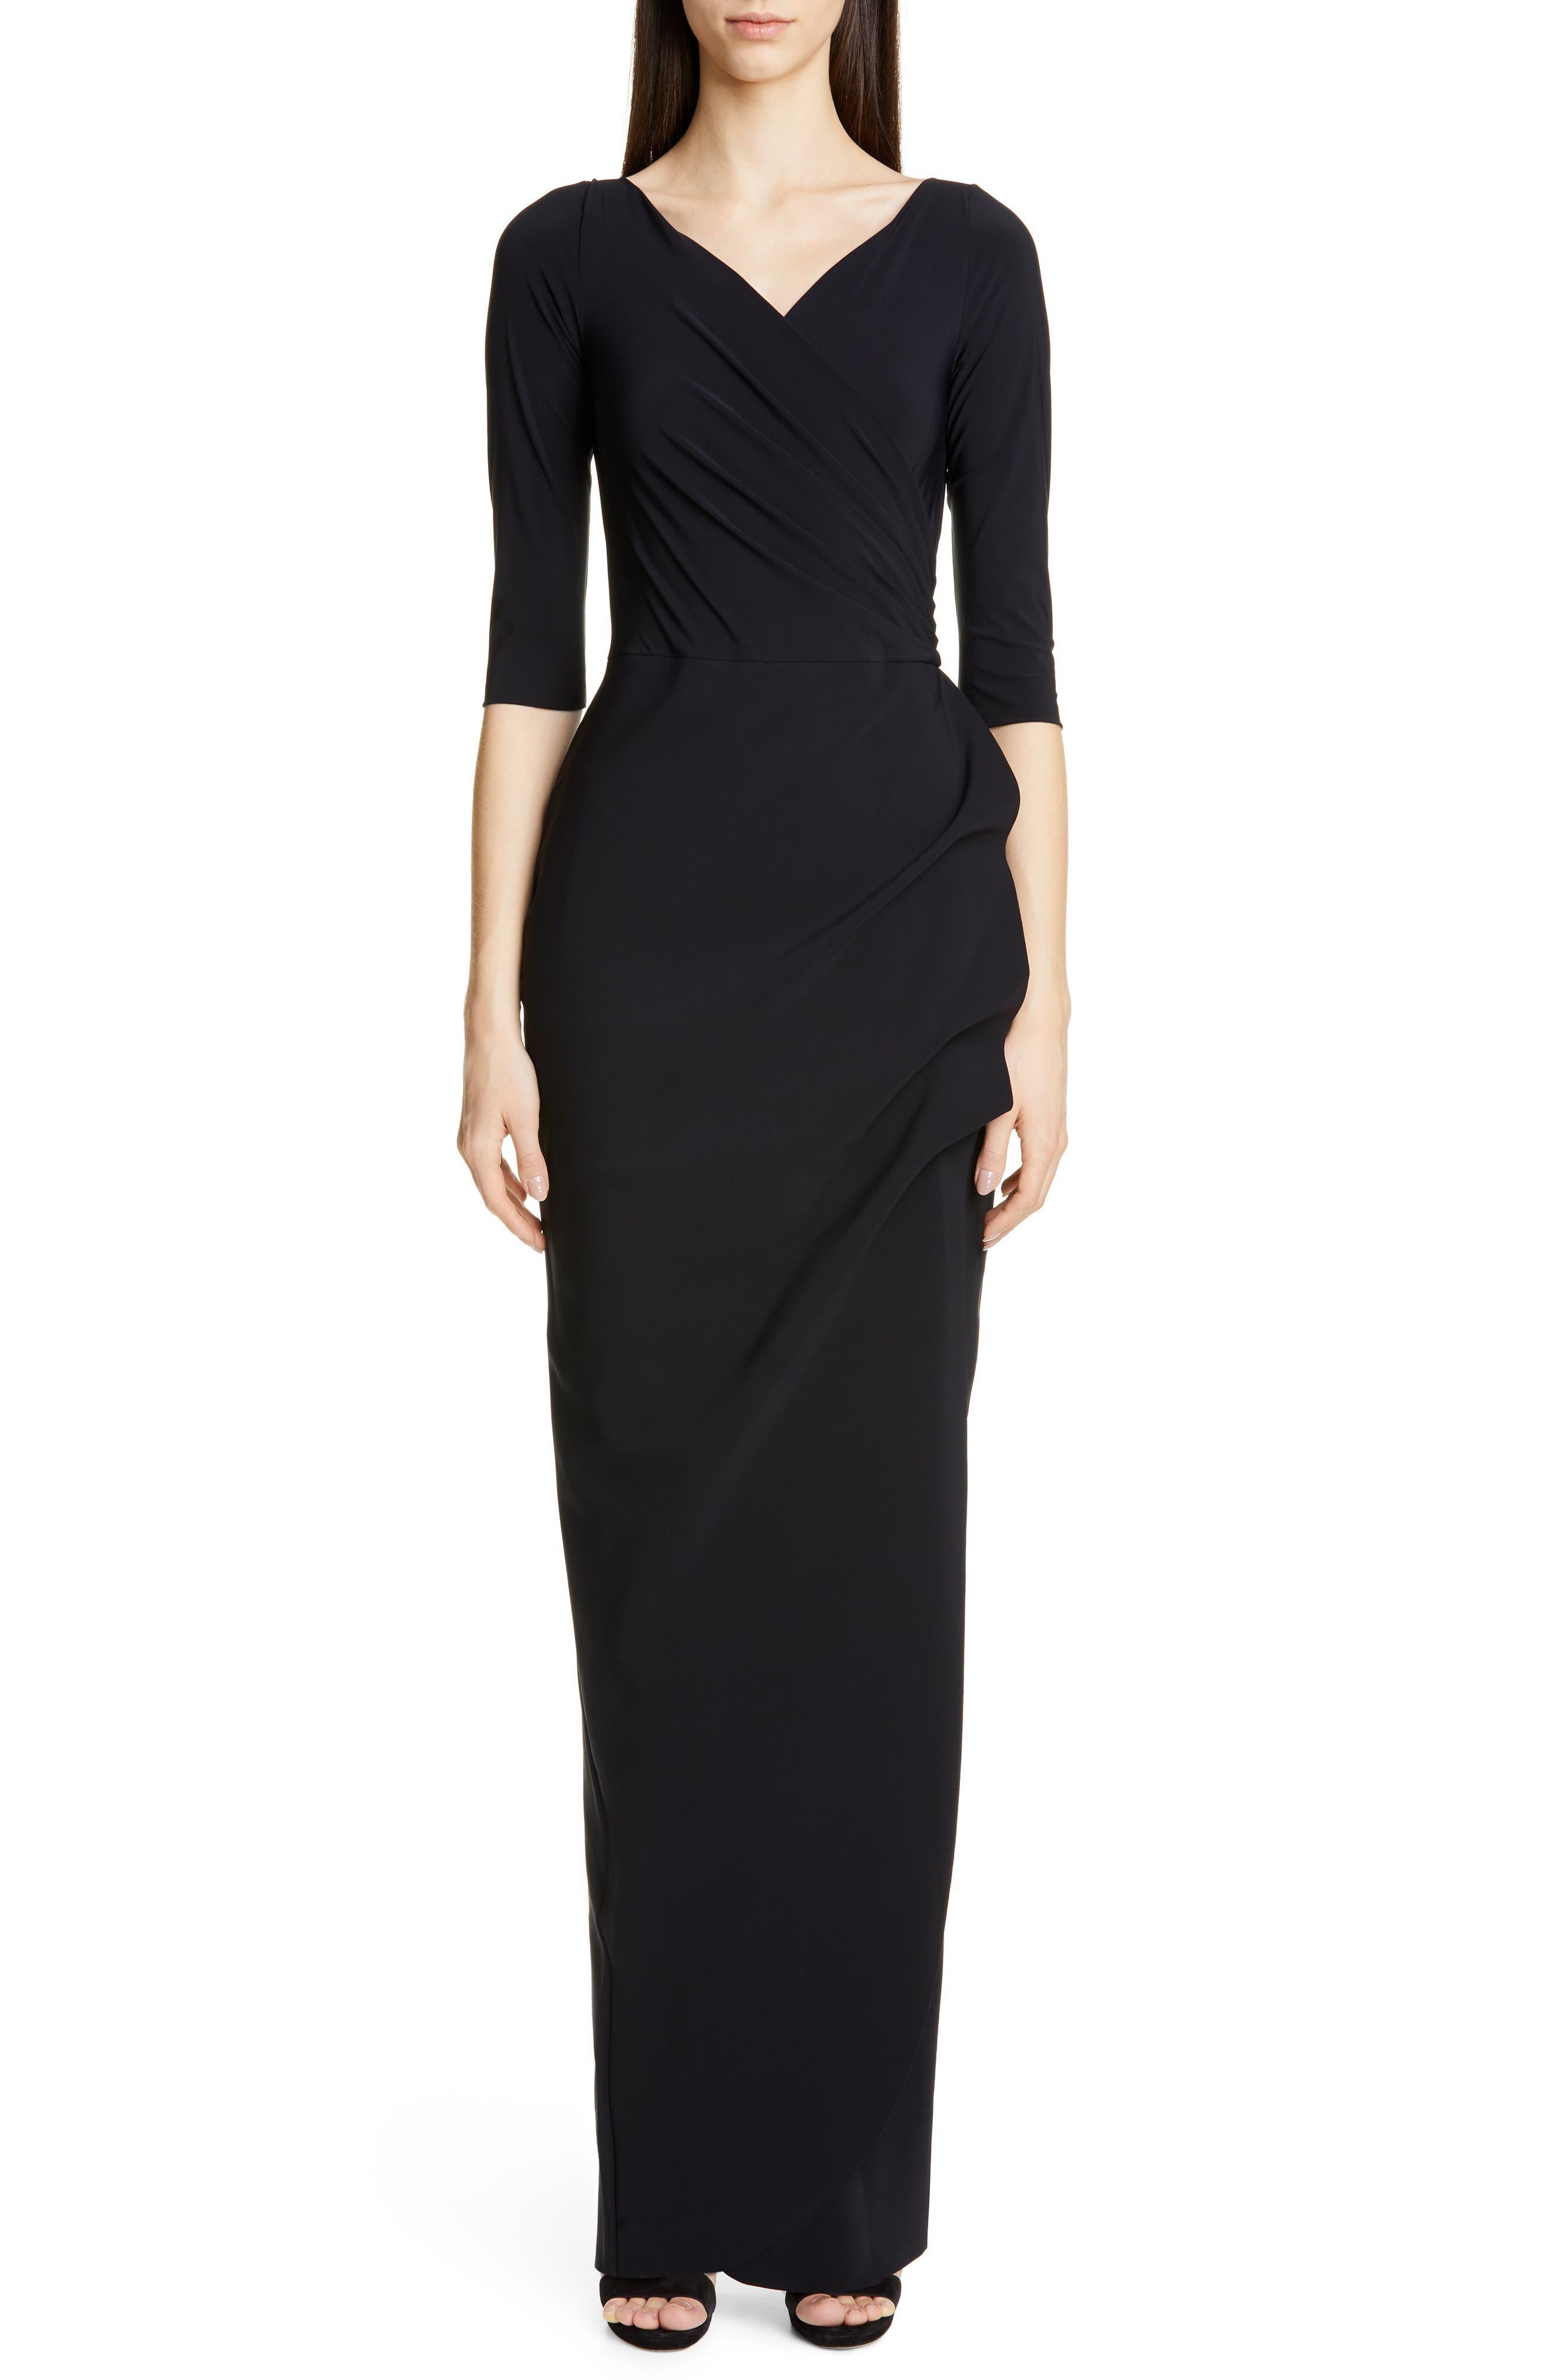 Chiara Boni La Petite Robe Florien Ruched Evening Dress, US / 52 IT - Black